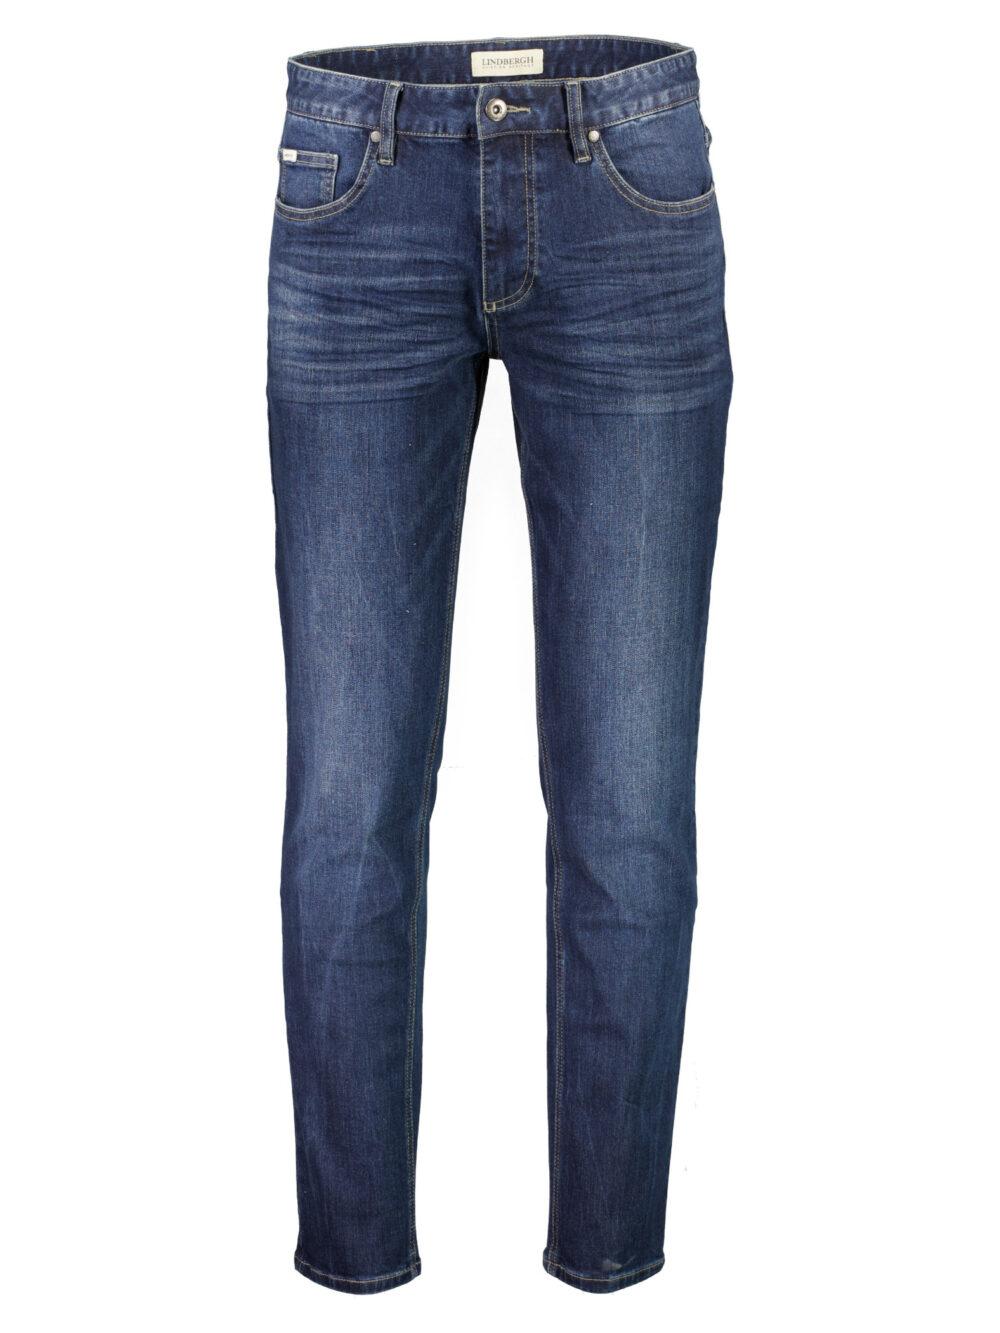 Lindbergh Superflex Jeans Rugged Ink Blue